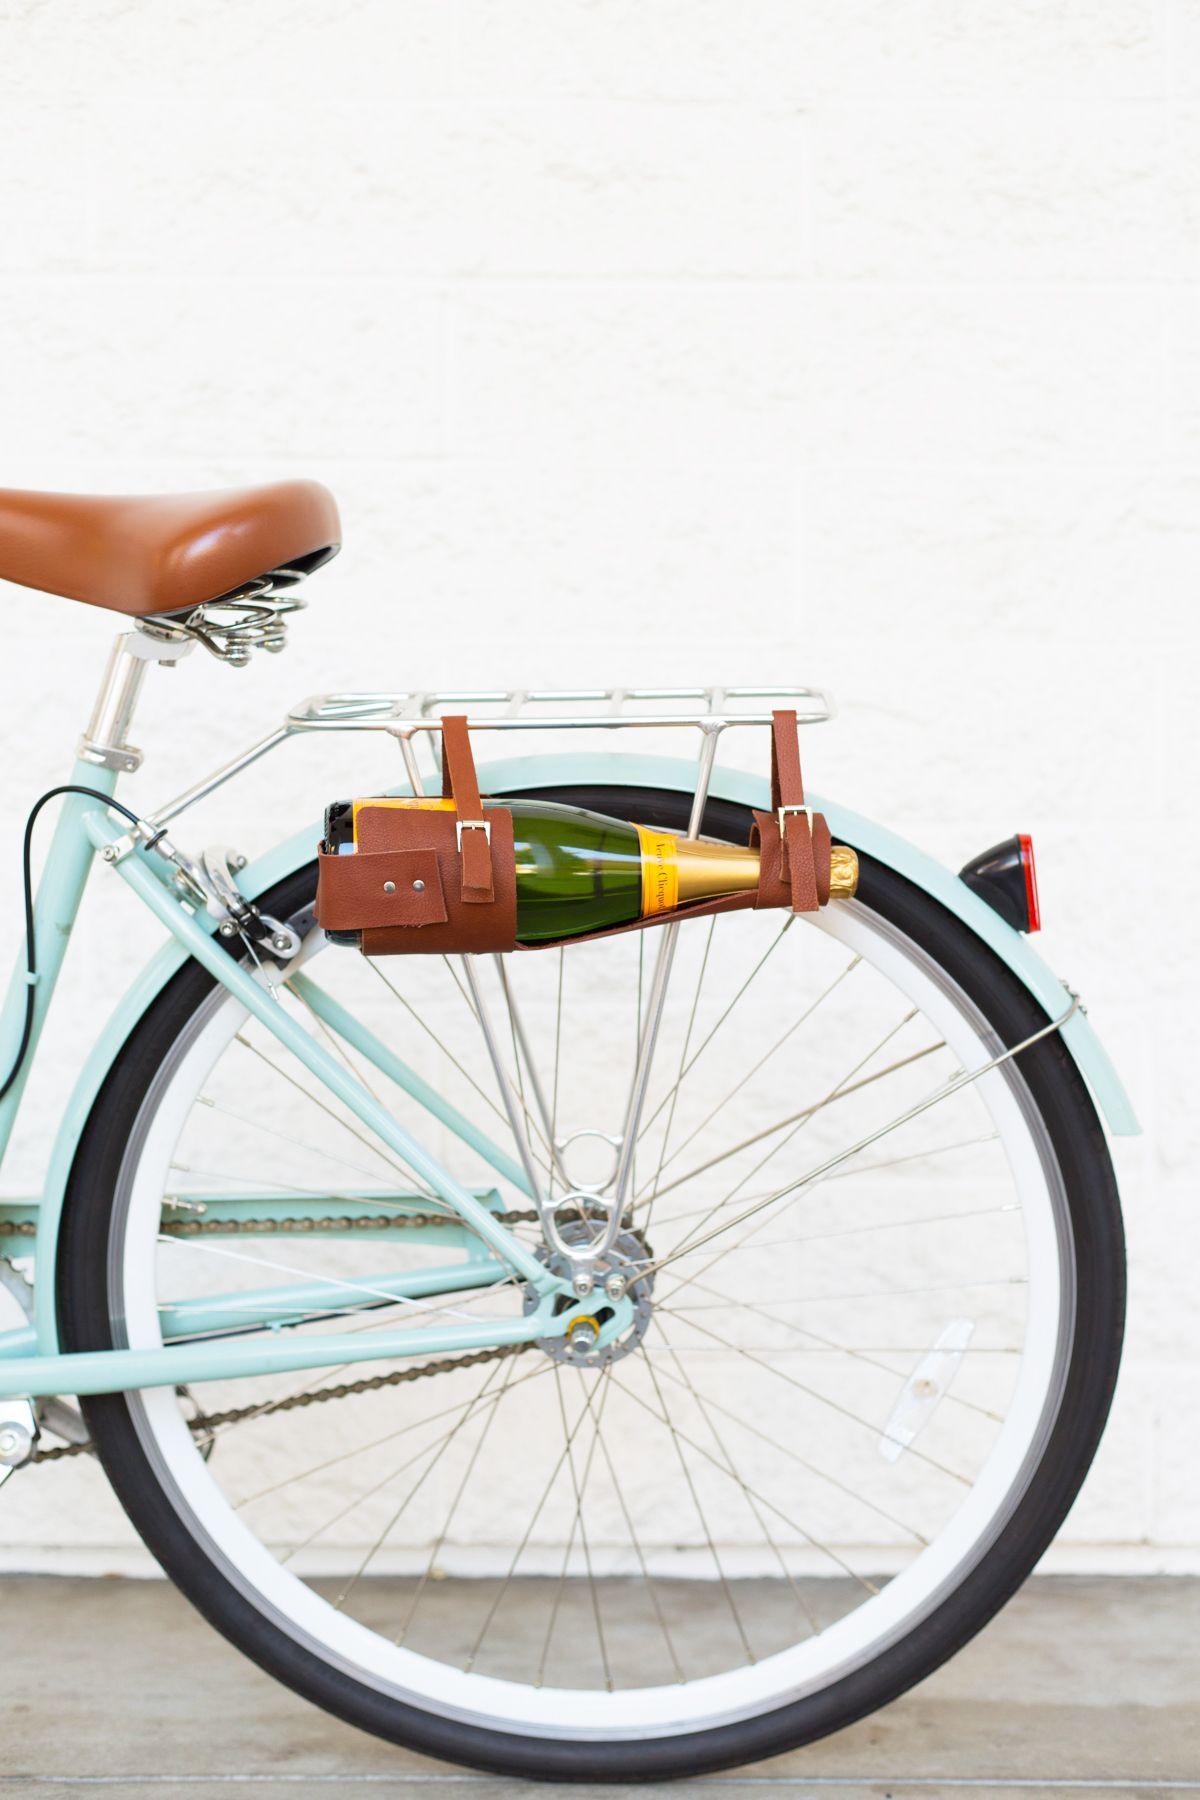 Diy wine bottle carrier bike giveaway wine gifts